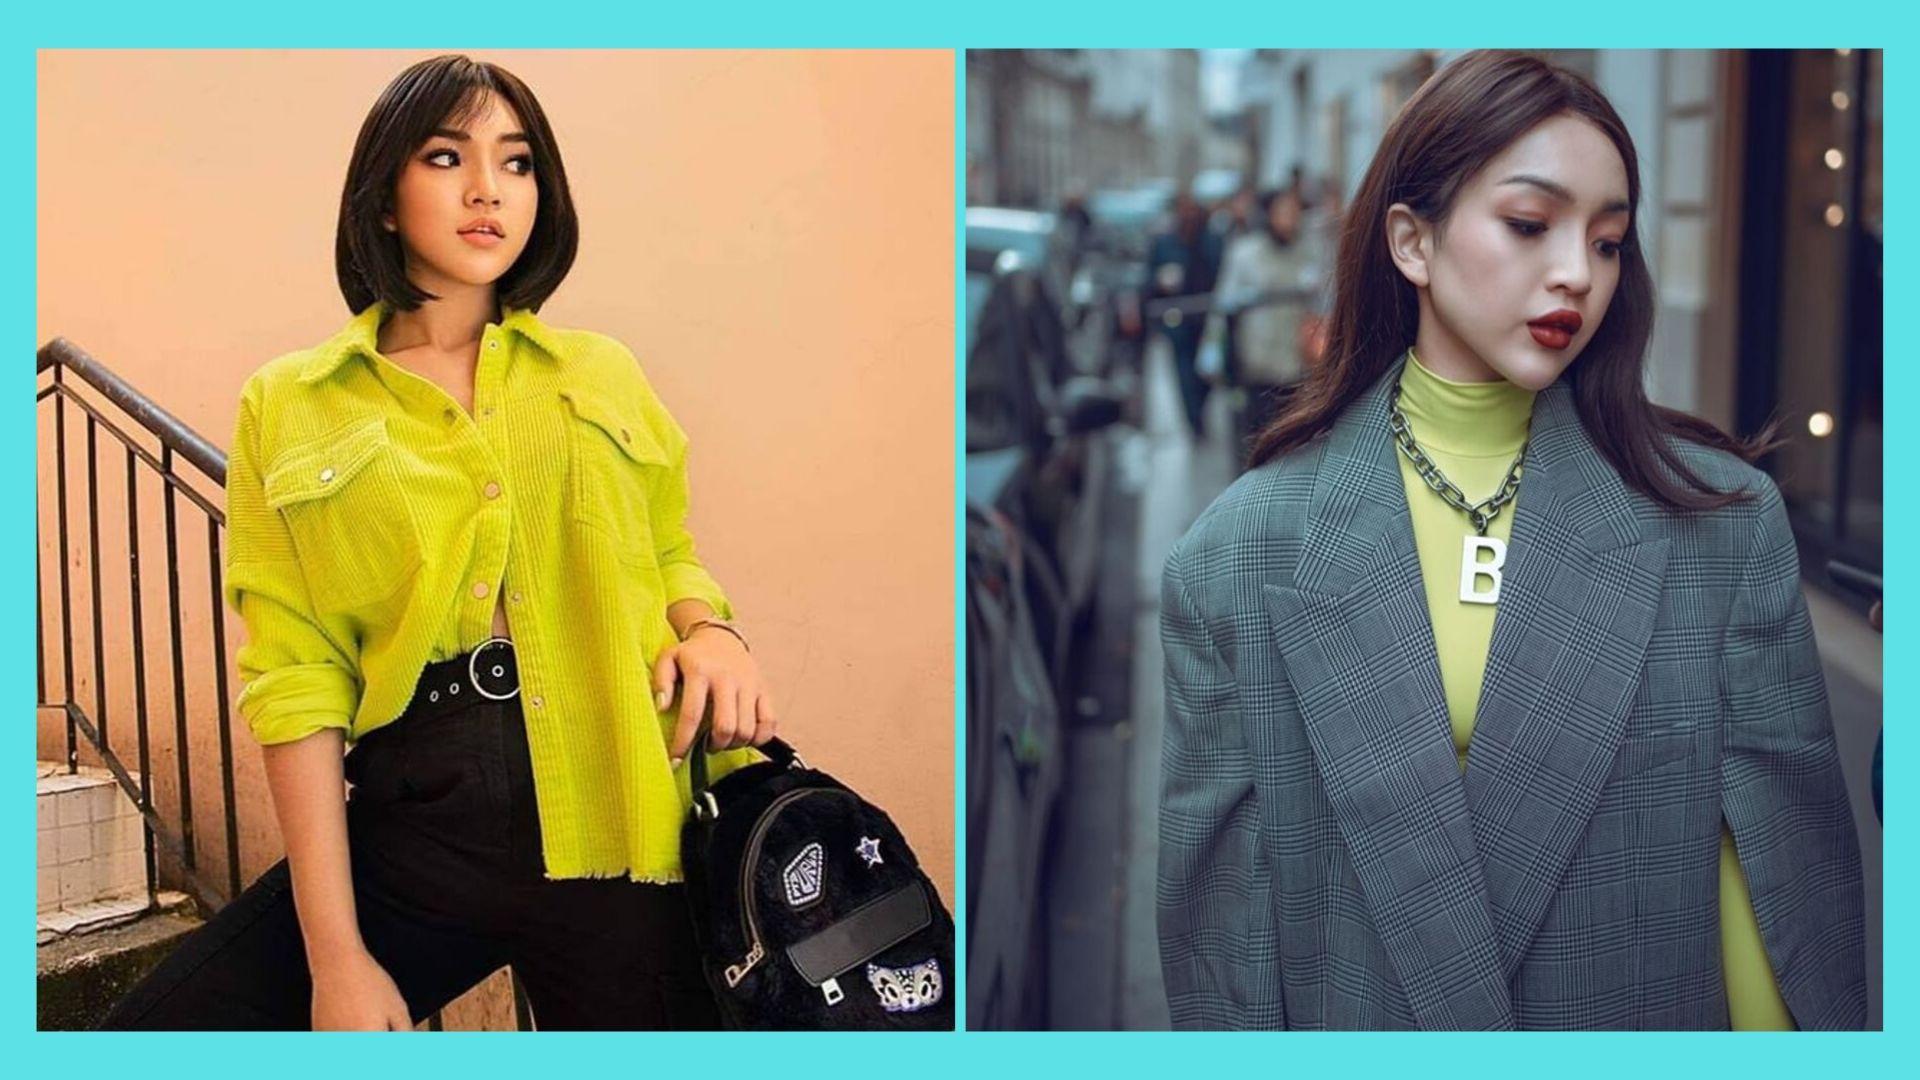 Paris fashion week 2019 ပဲြအတြက္ ပဲရစ္ကို ေရာက္႐ွိေနတဲ့ Beauty Blogger မင္းသမီး ေနျခည္ဦး